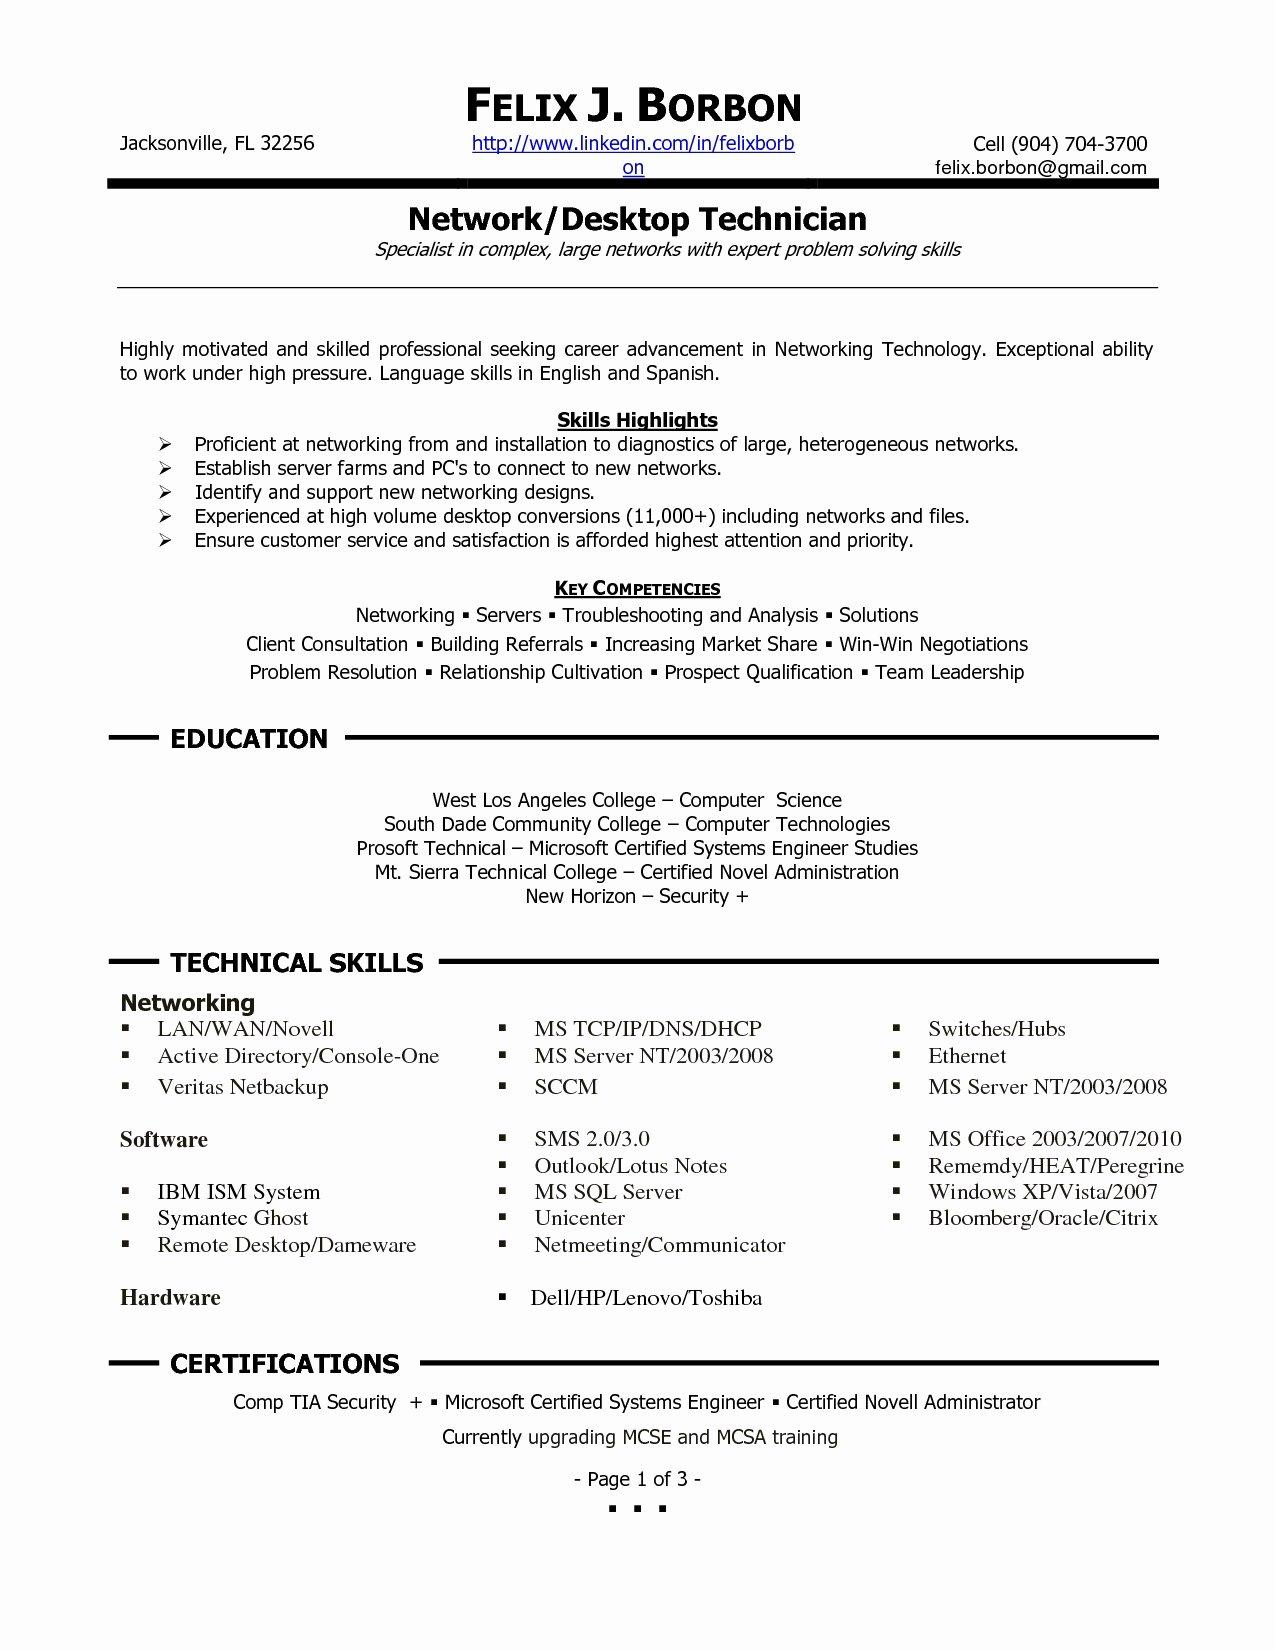 Resume Templates Desktop Support Technician Resumes Donkey